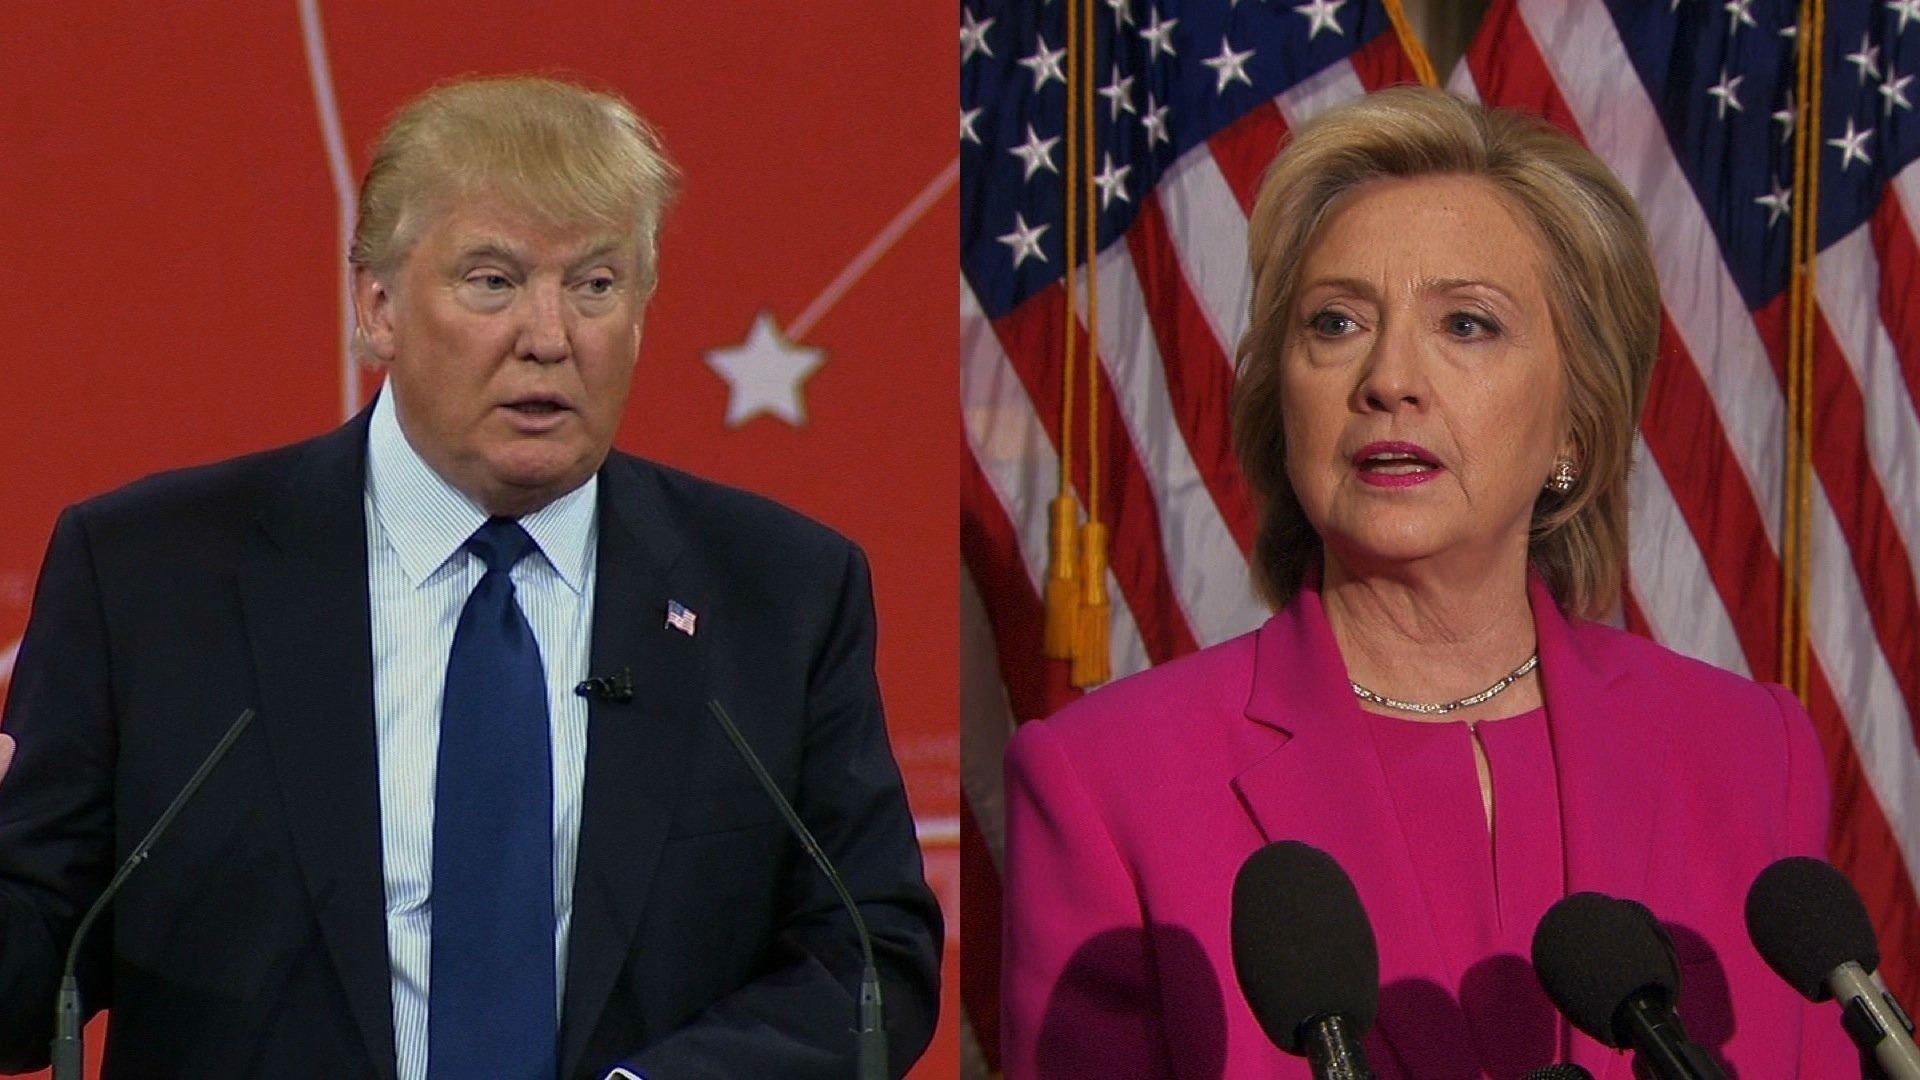 CNN Florida poll: Donald Trump 47%, Hillary Clinton 44%